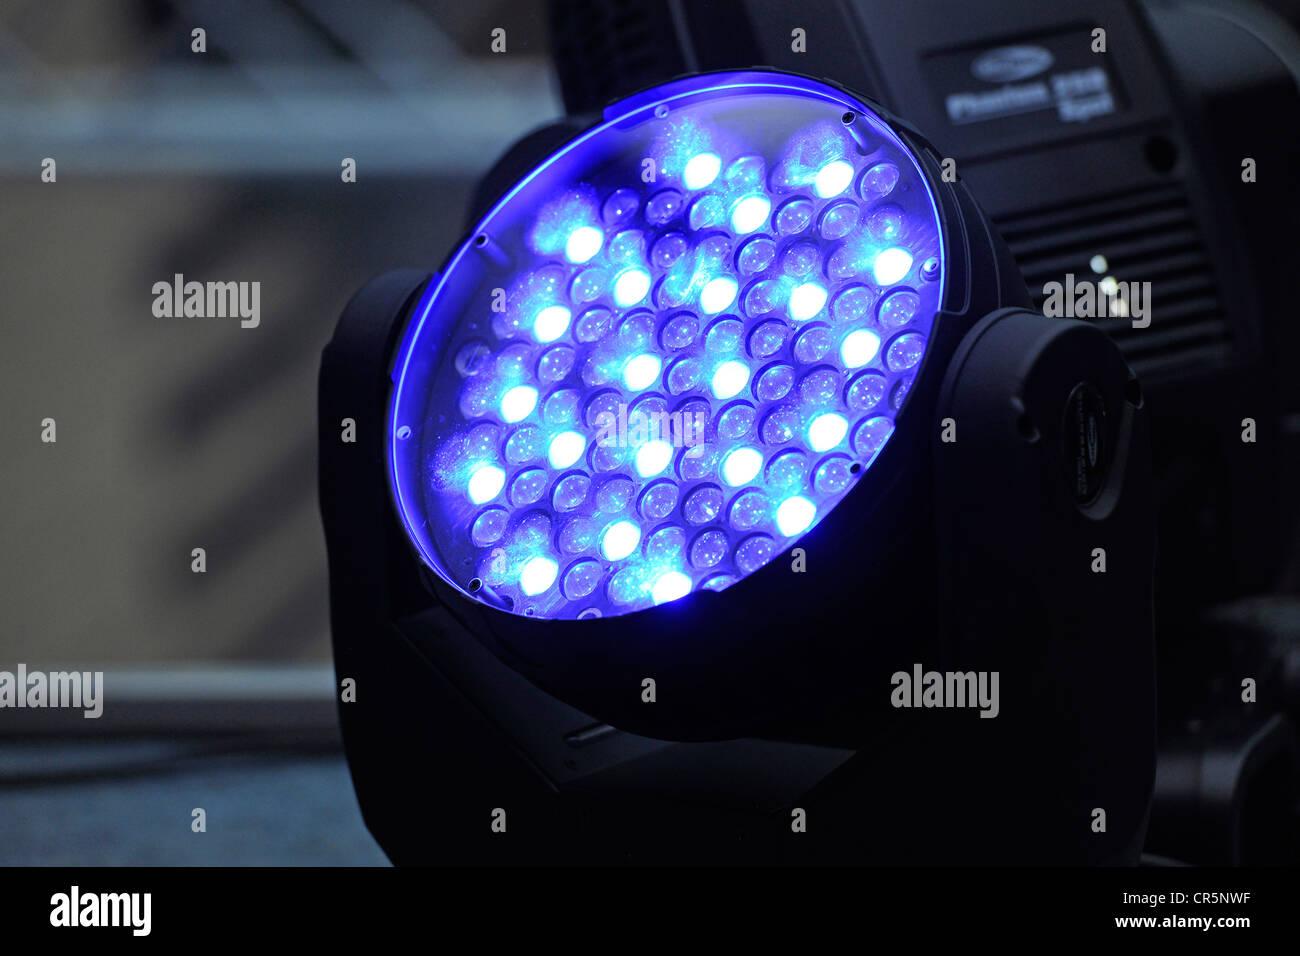 Caso di illuminazione, luce laser, luci blu Immagini Stock